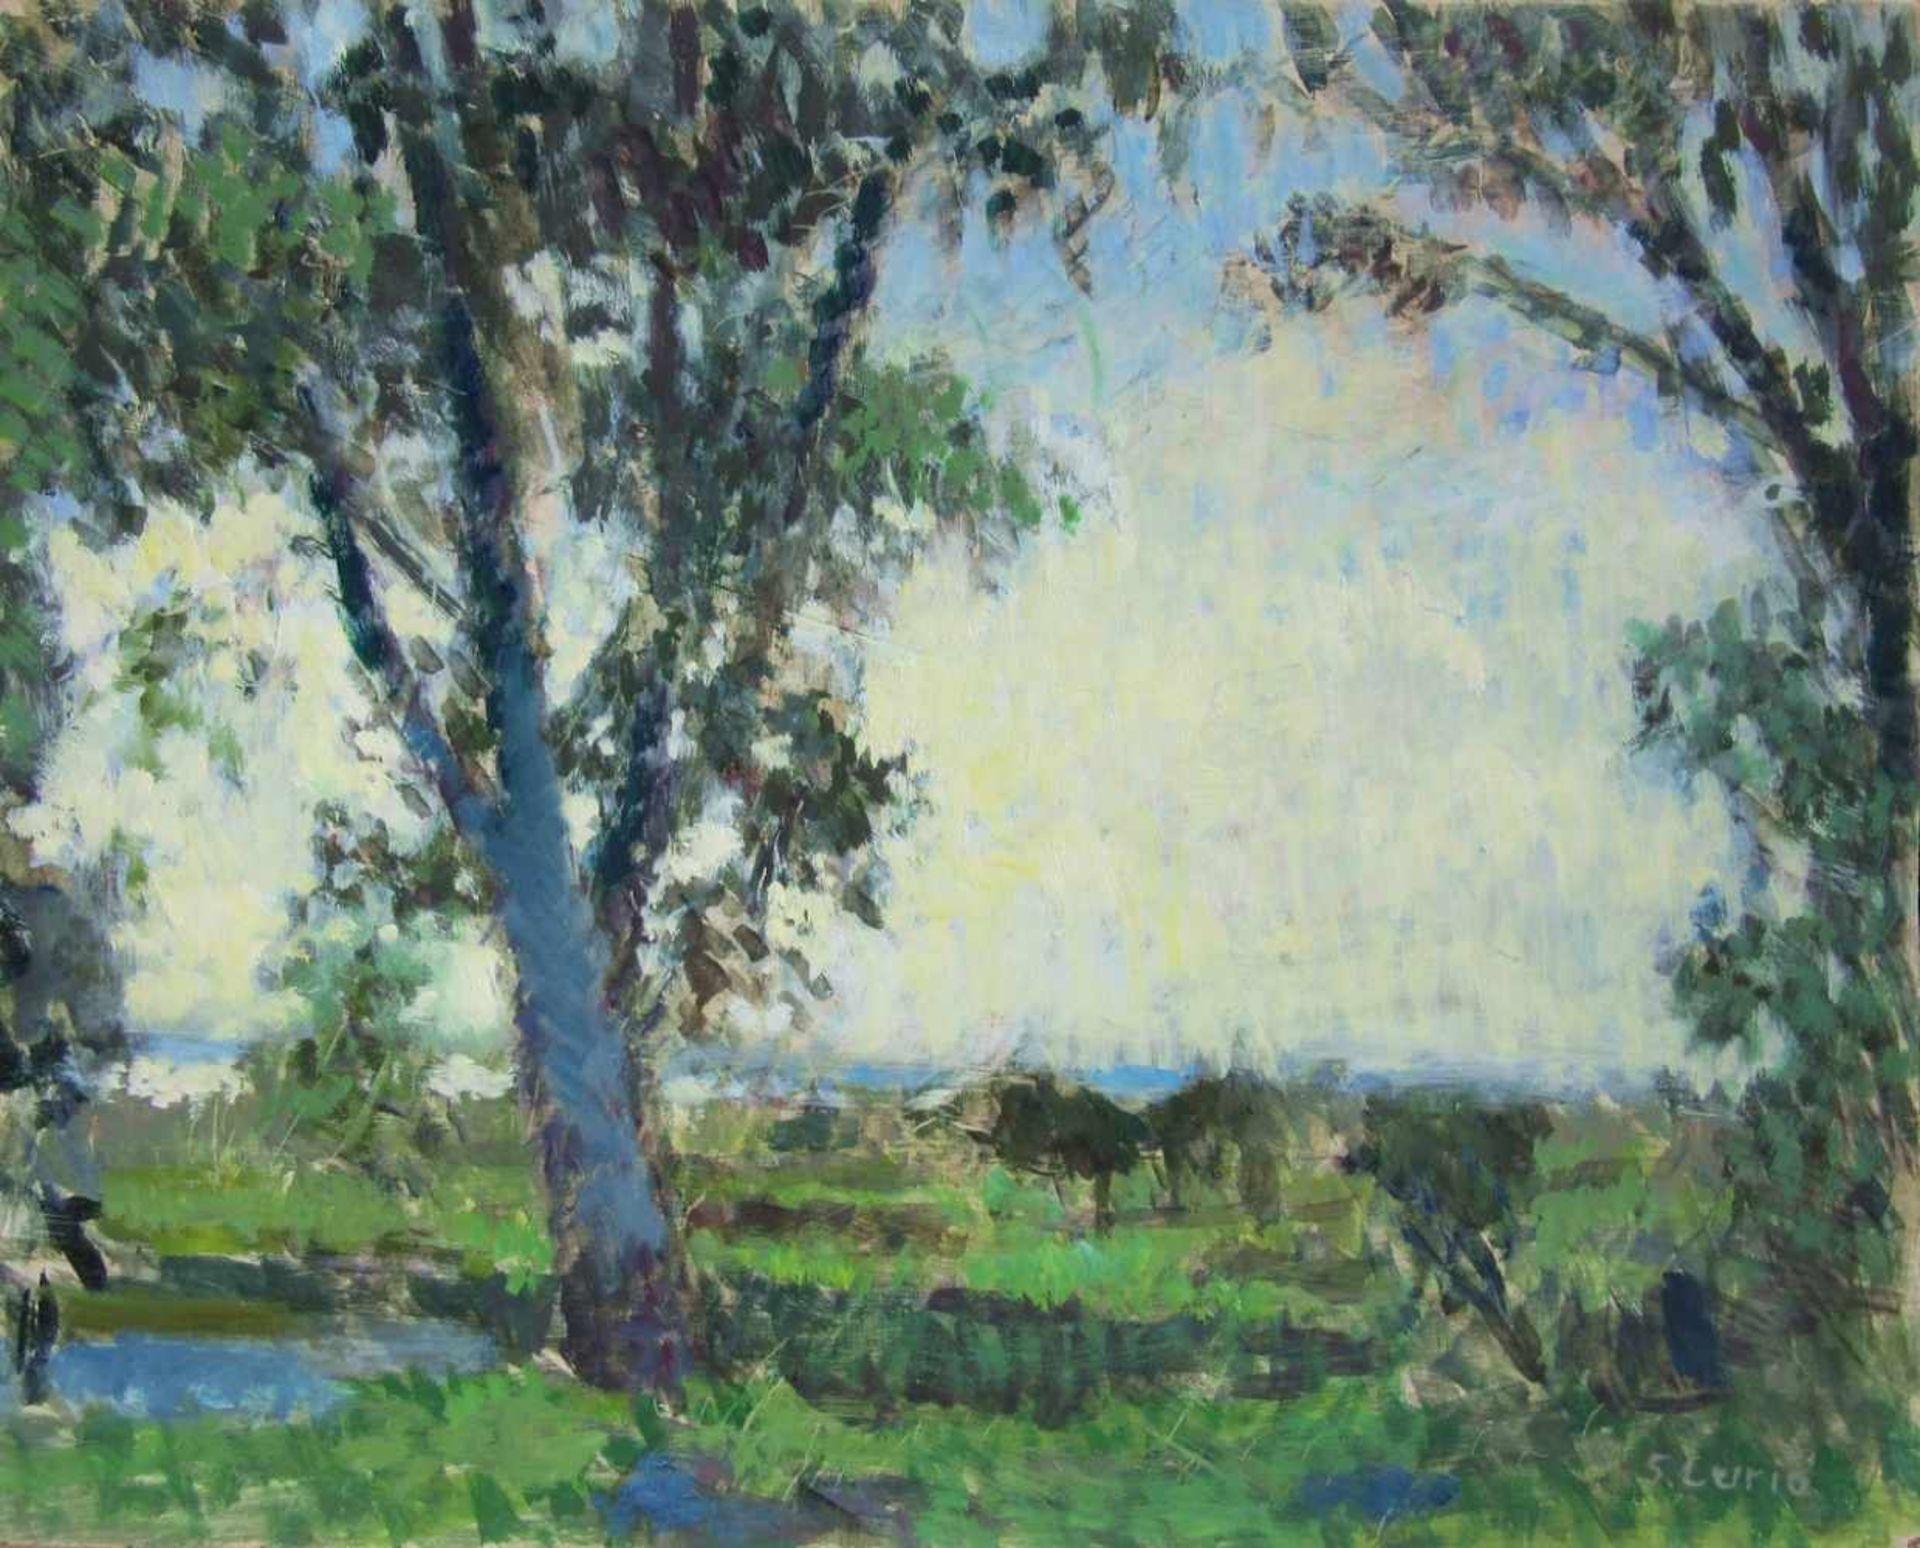 Curio, Sabine (1950 Ahlbeck, lebt in Stolpe auf Usedom)